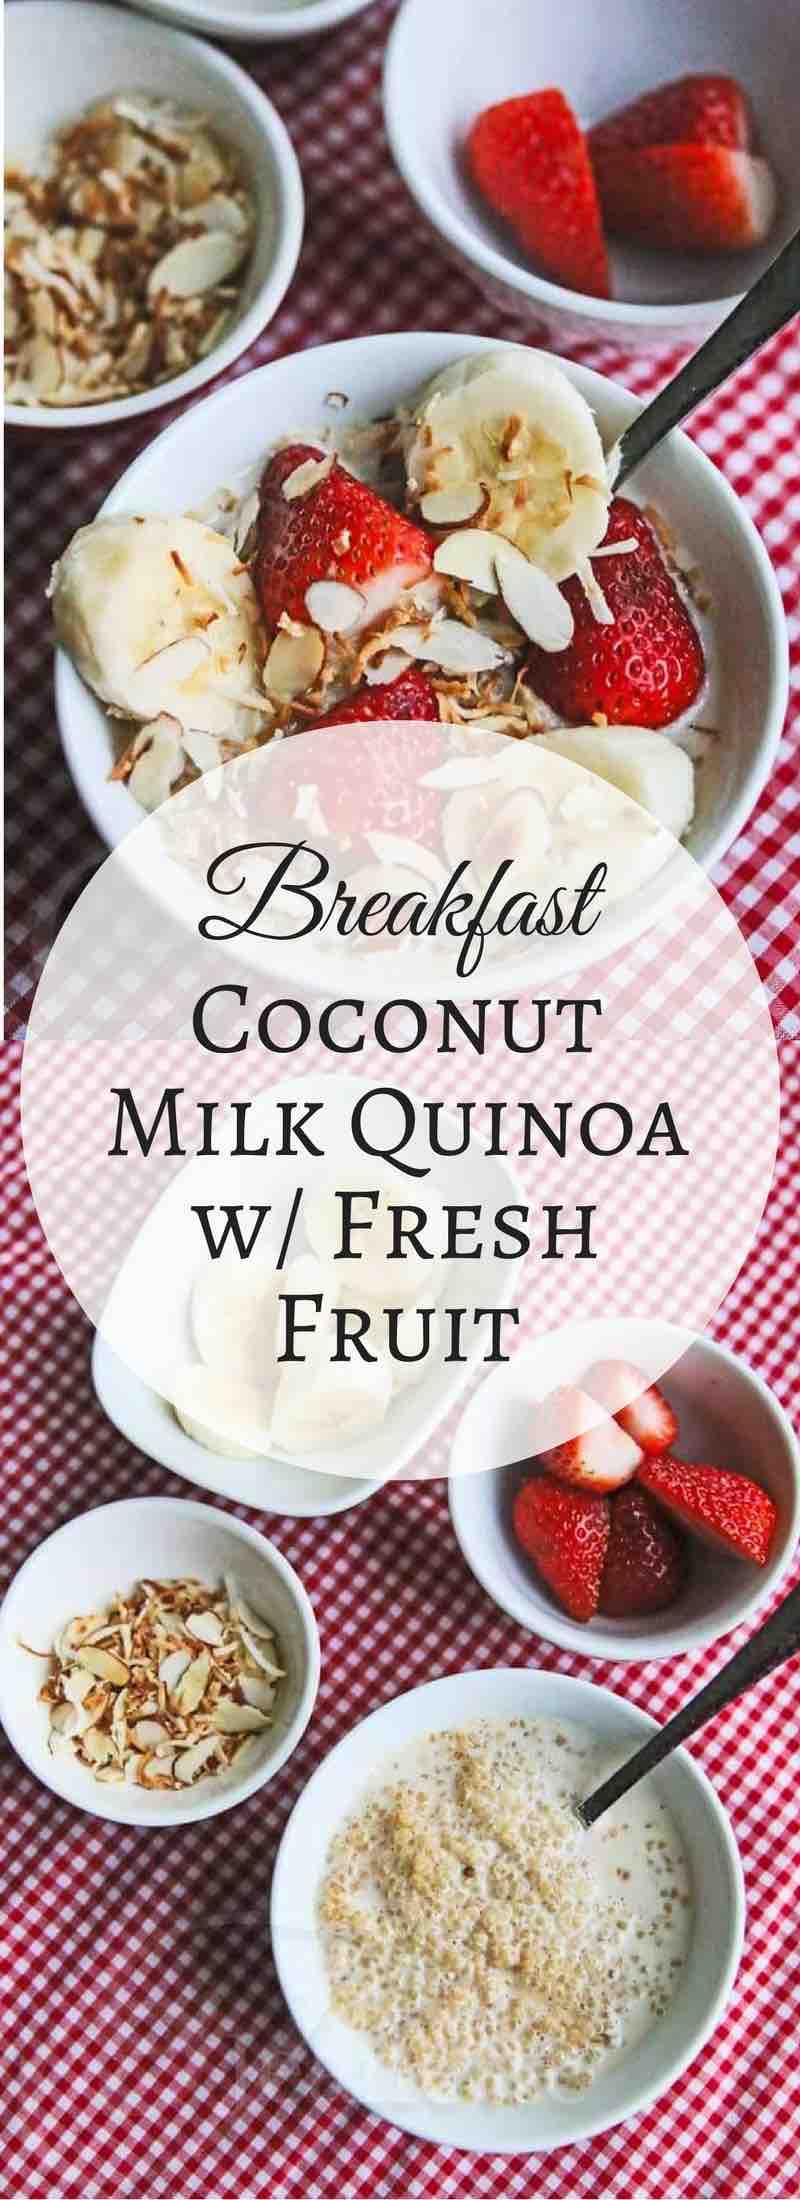 breakfast coconut milk quinoa with fresh fruit recipe {video